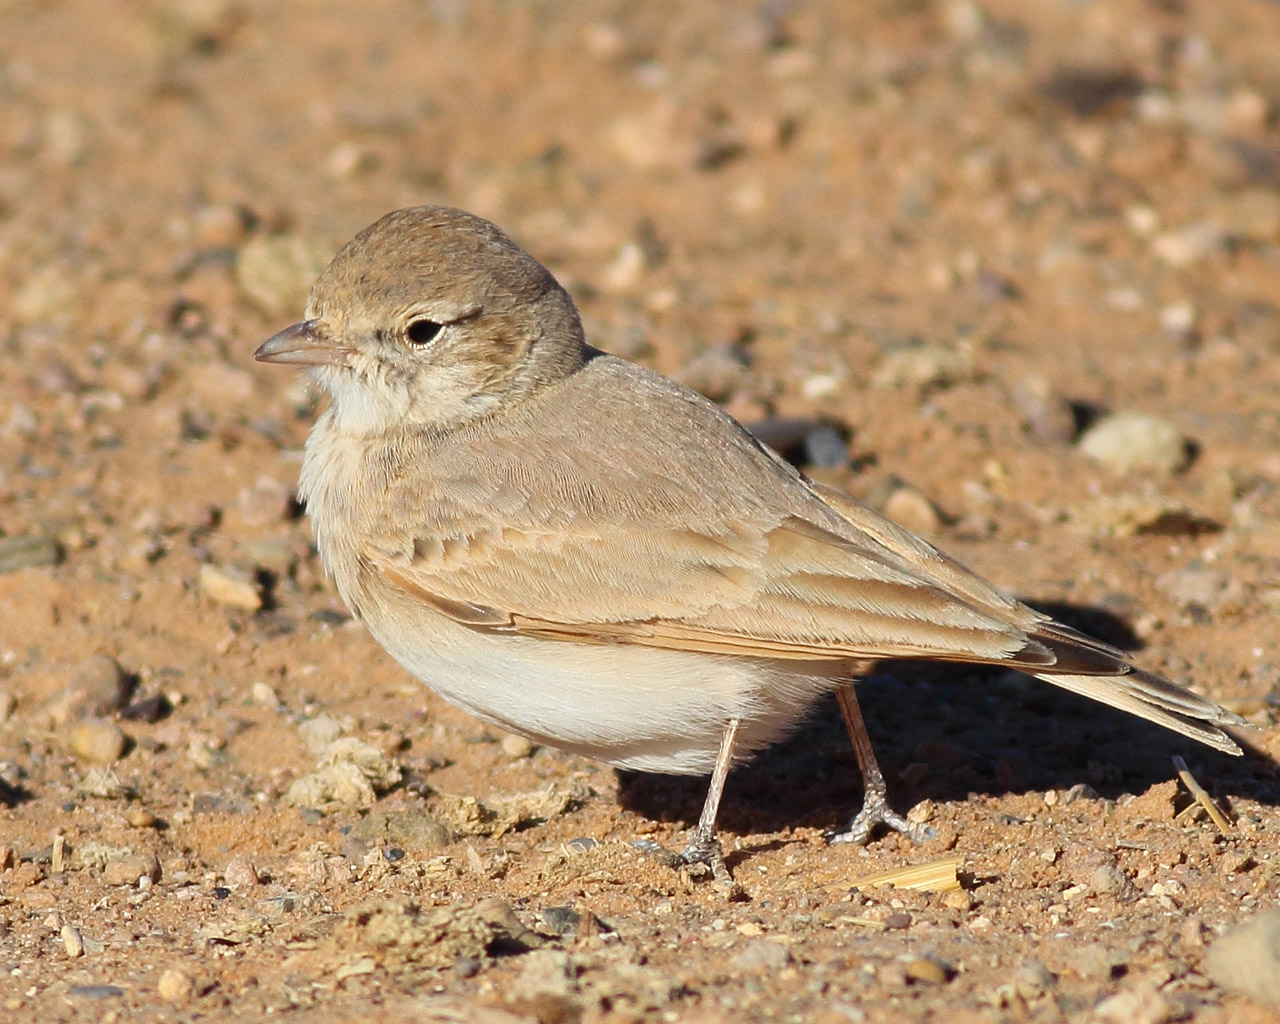 06_sandlerche_bar-tailed-lark_erg-chebbi_marokko_daehne_088